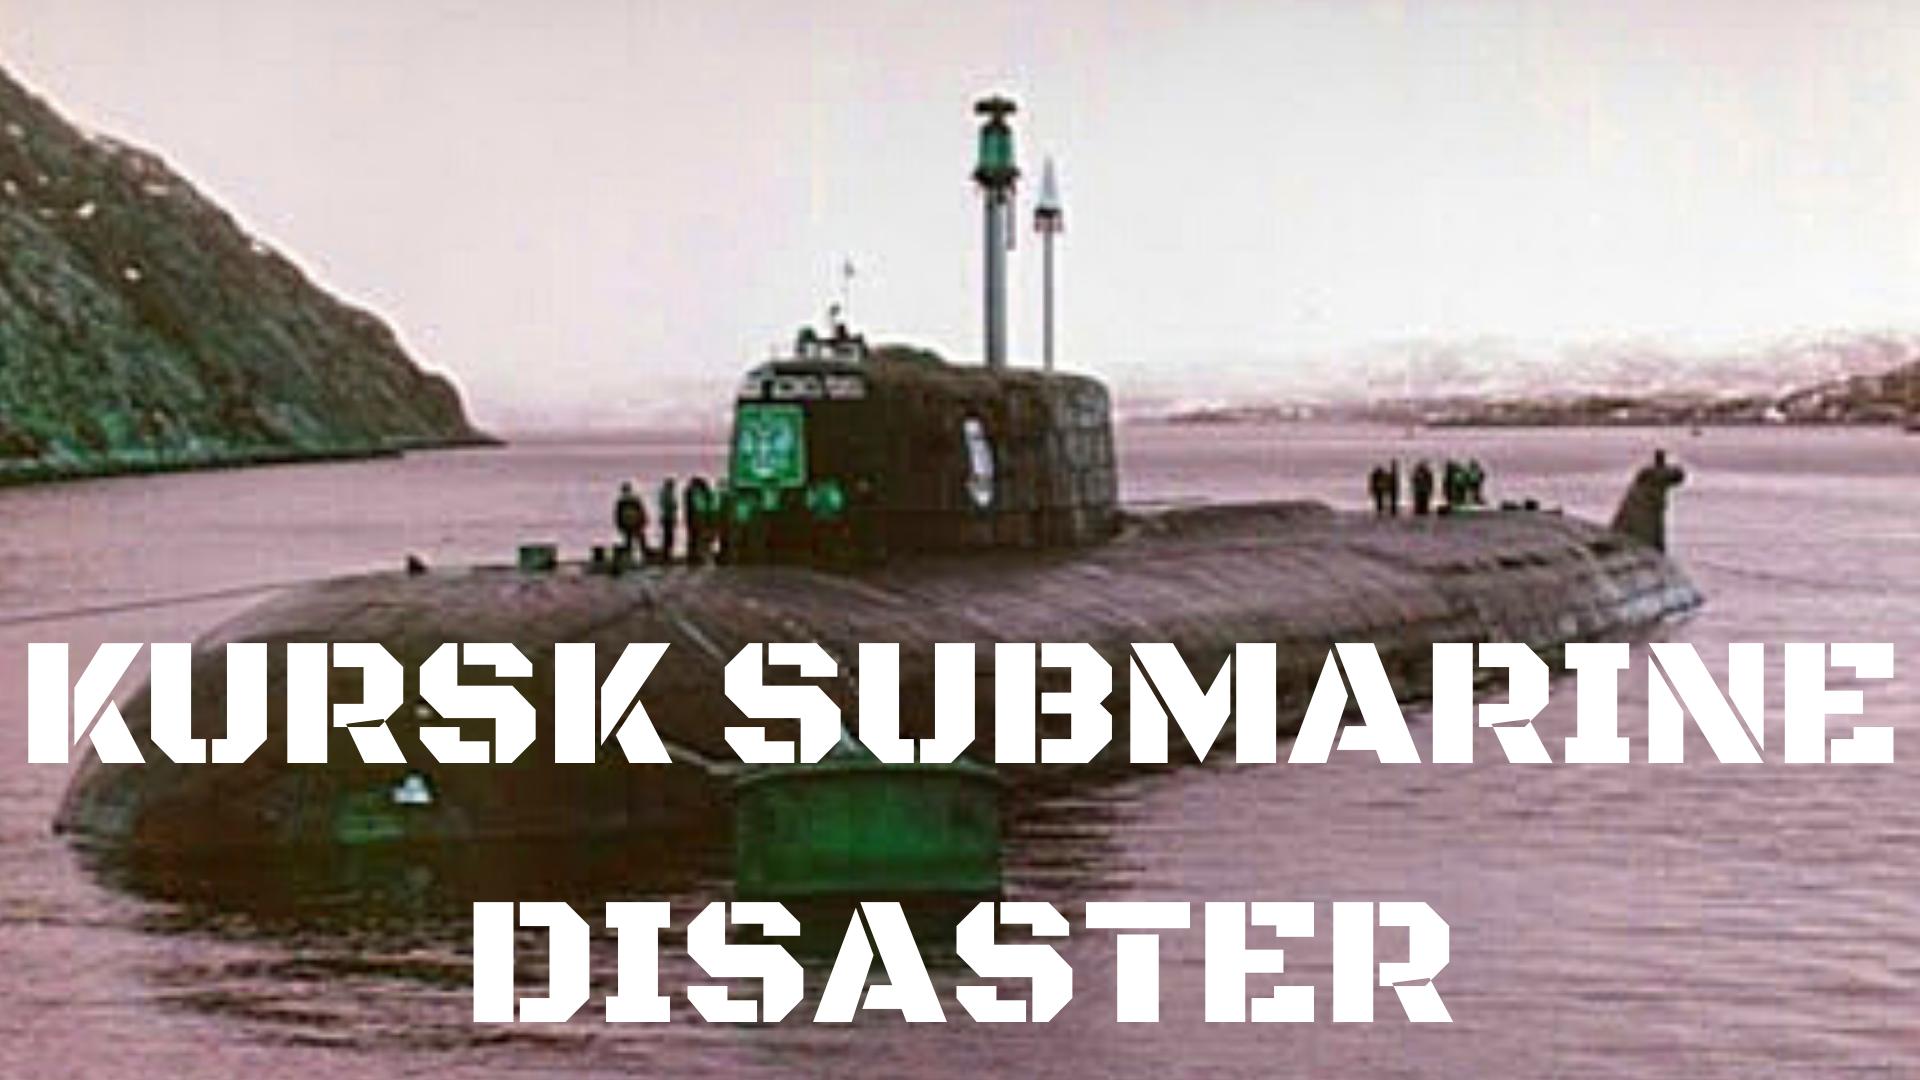 Kursk Submarine Disaster